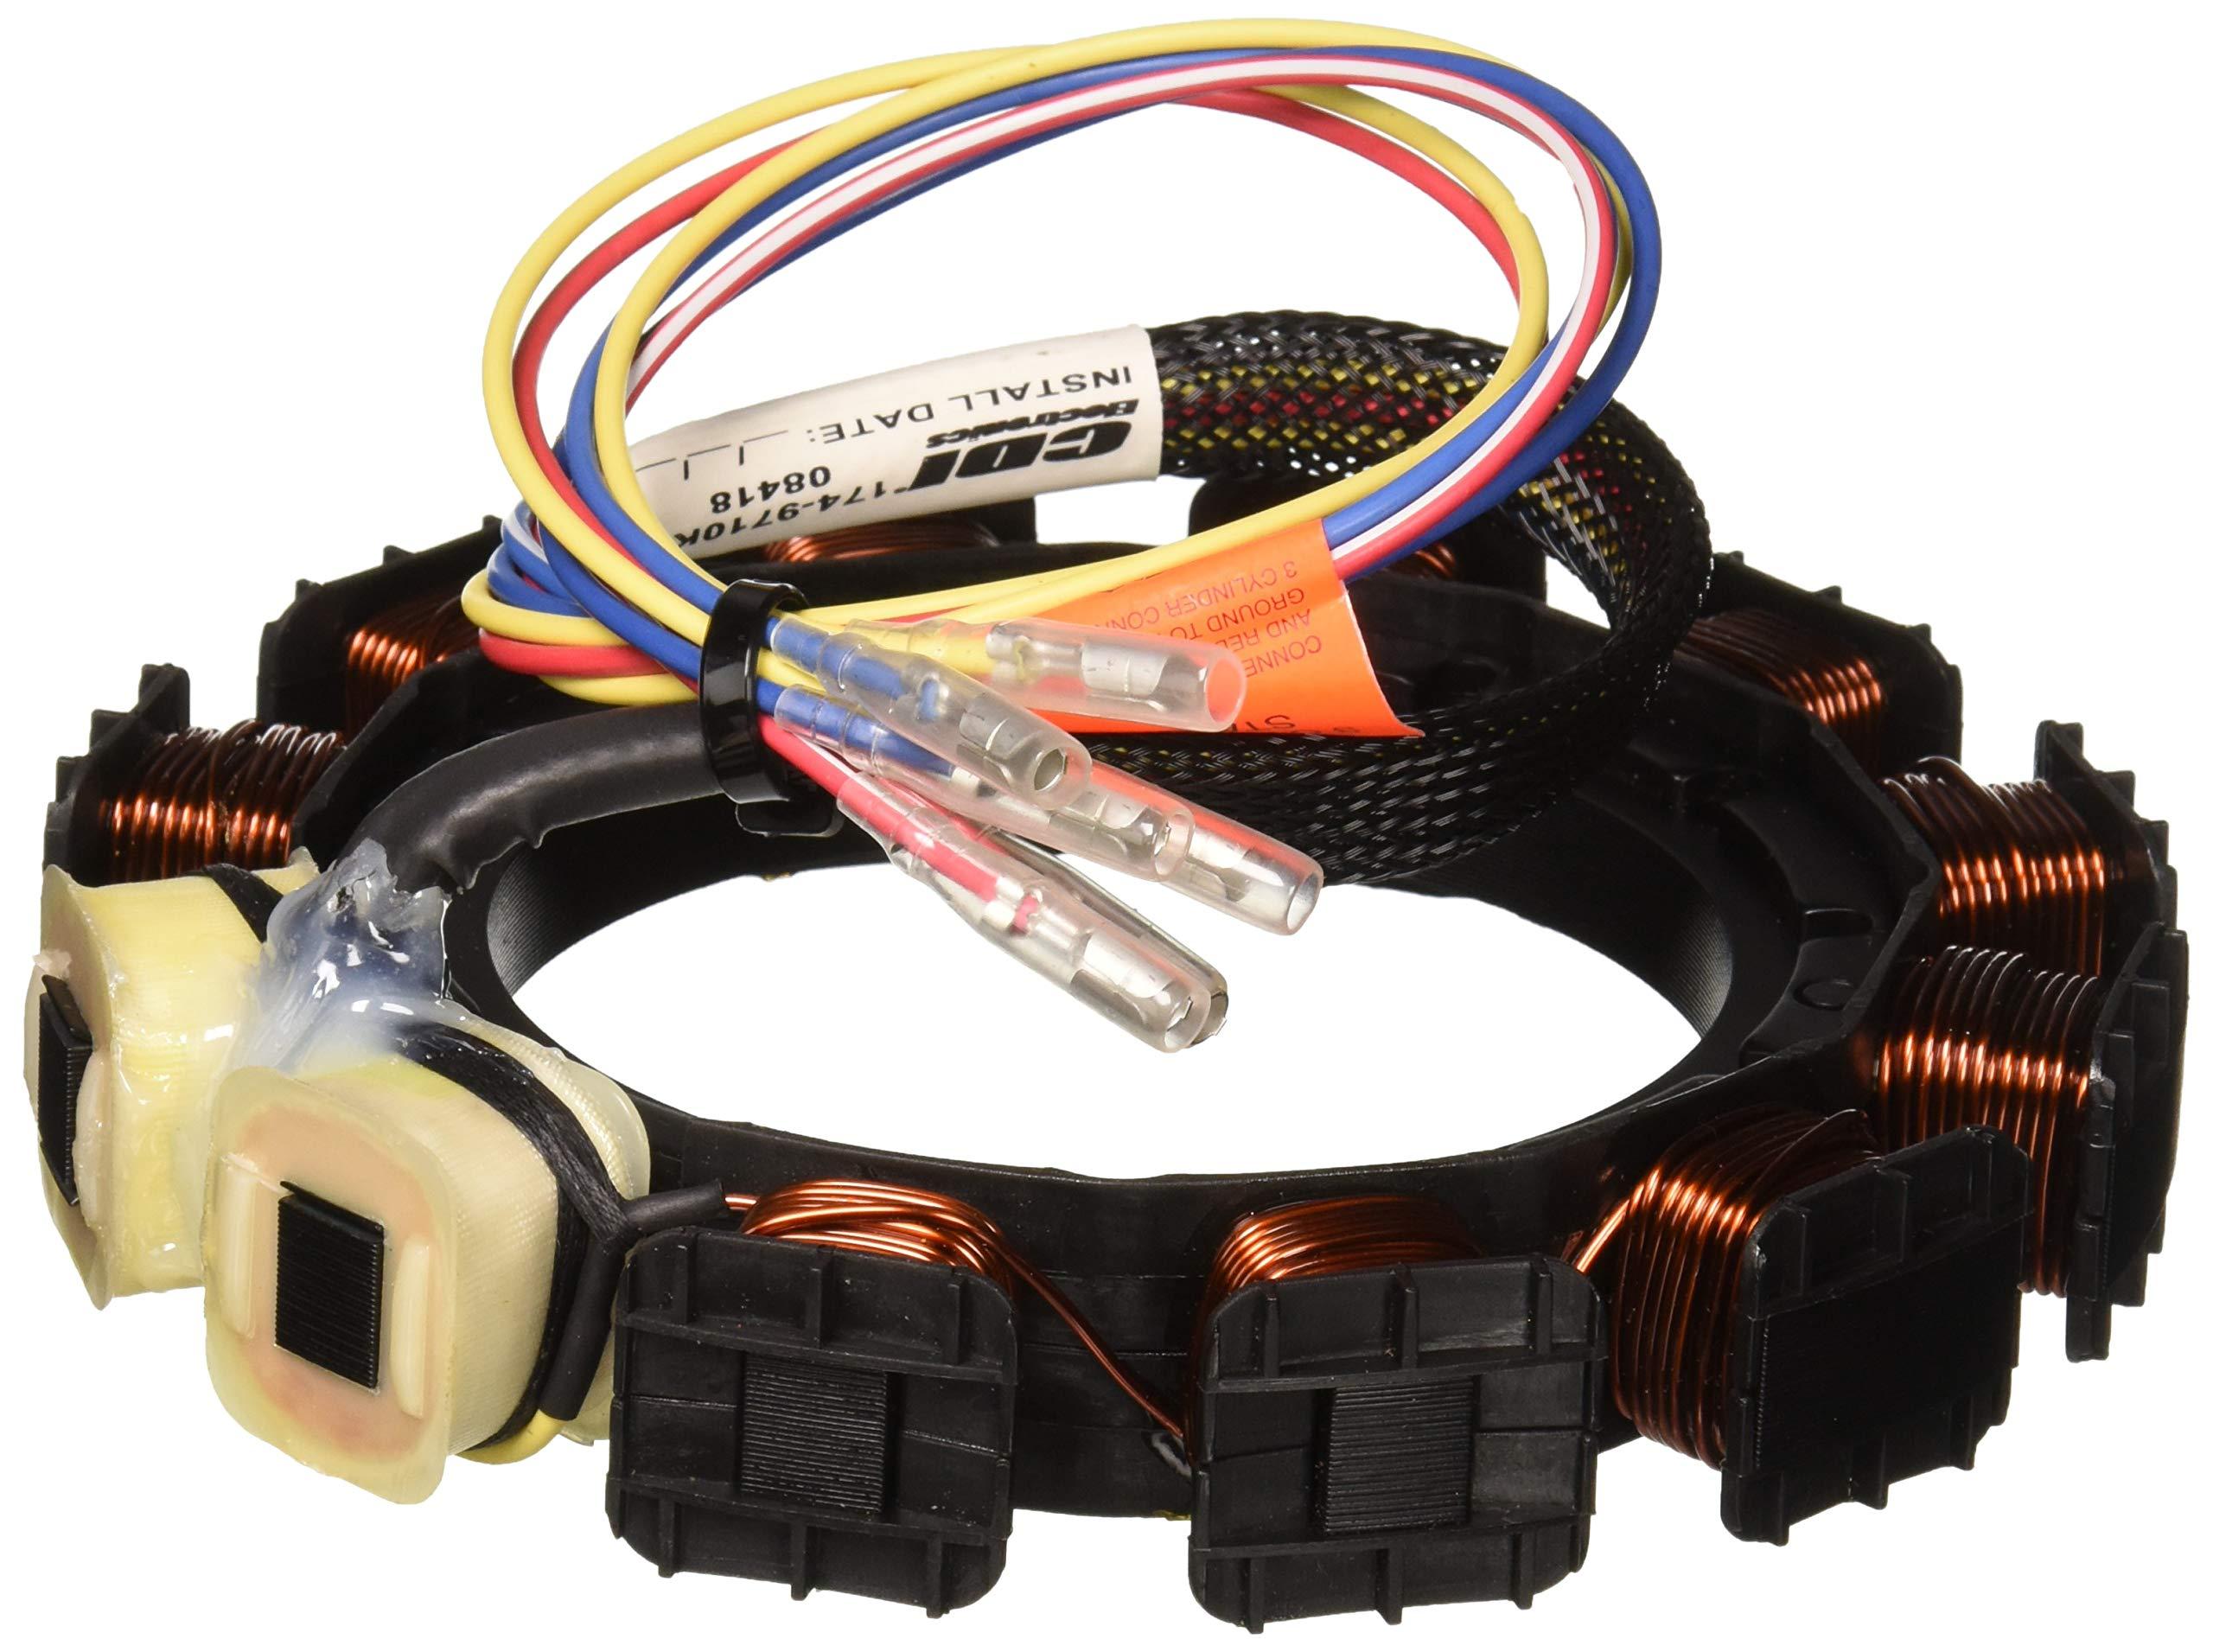 CDI Electronics 174-9710K1 174-9710K 1 Mercury/Mariner Stator-2/3/4 Cyl. 16 Amp (1987-1997)